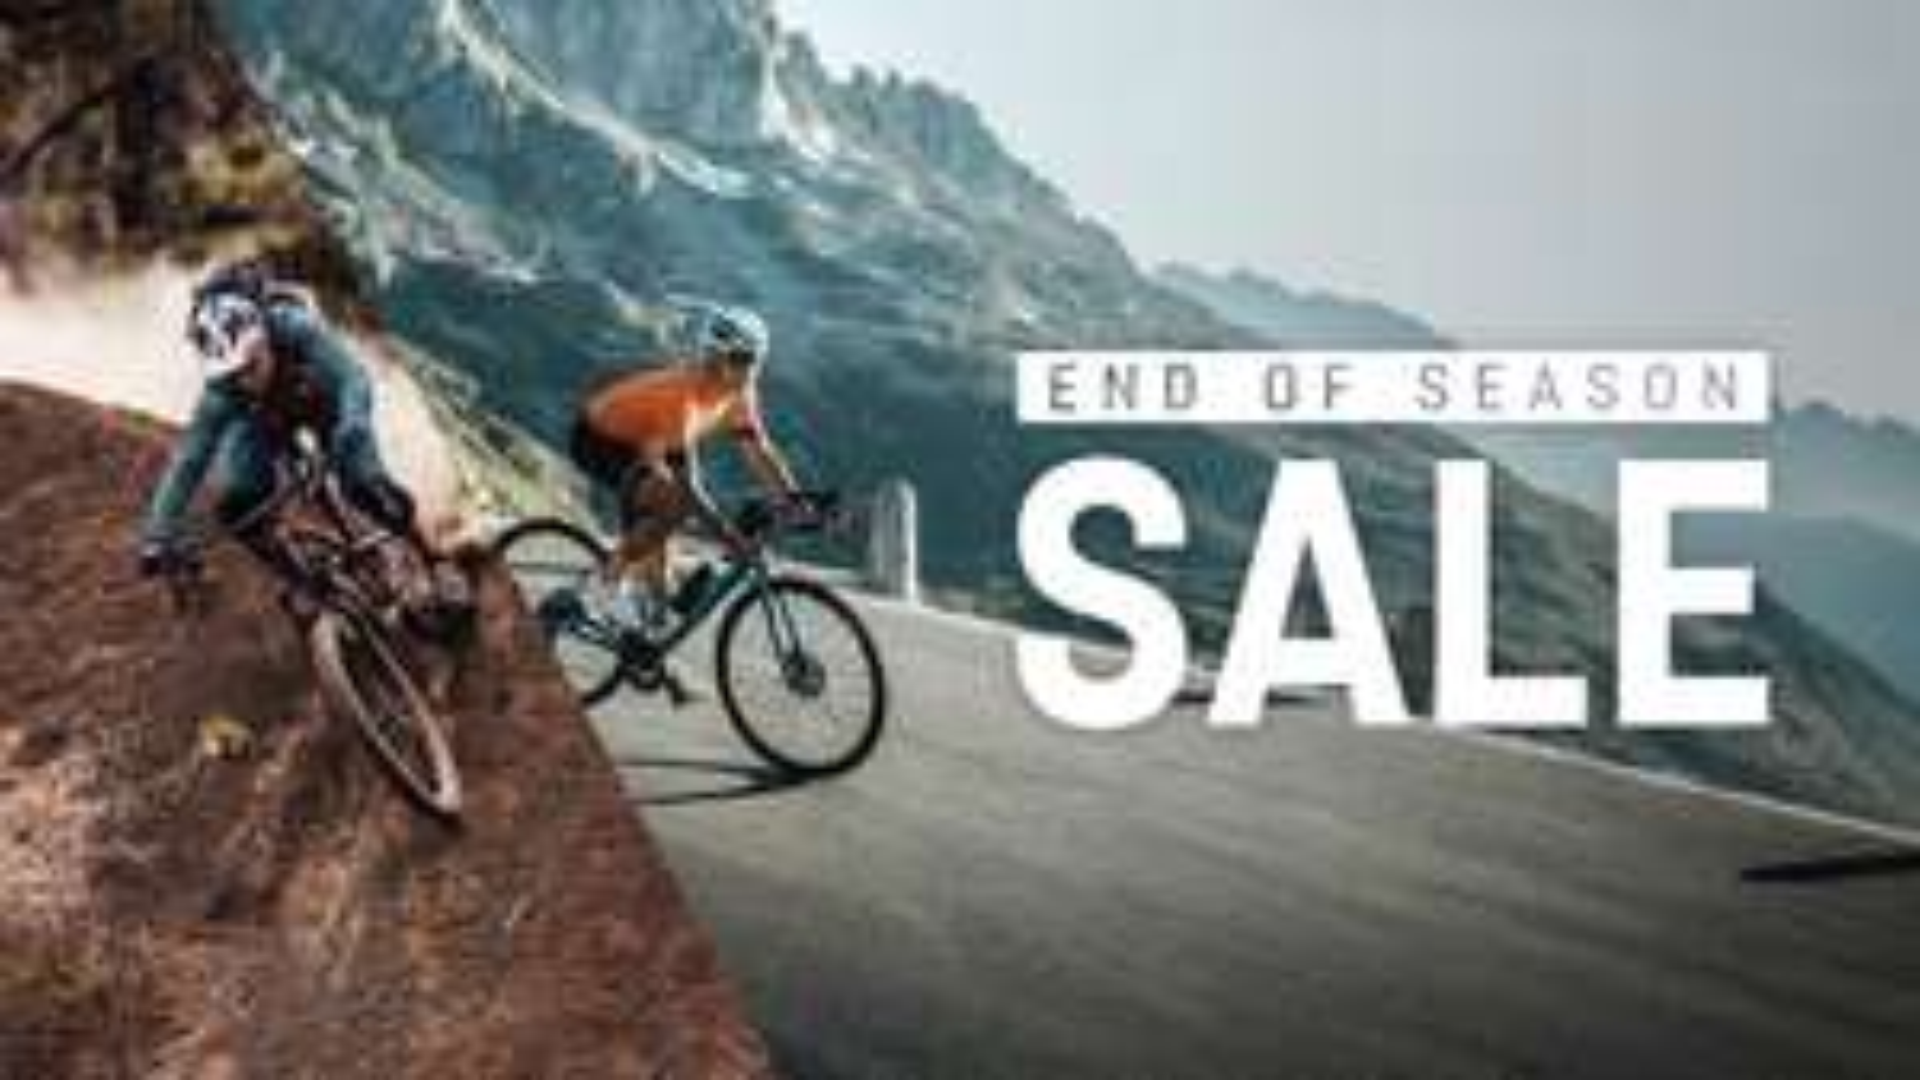 CANYON End of Season Sale